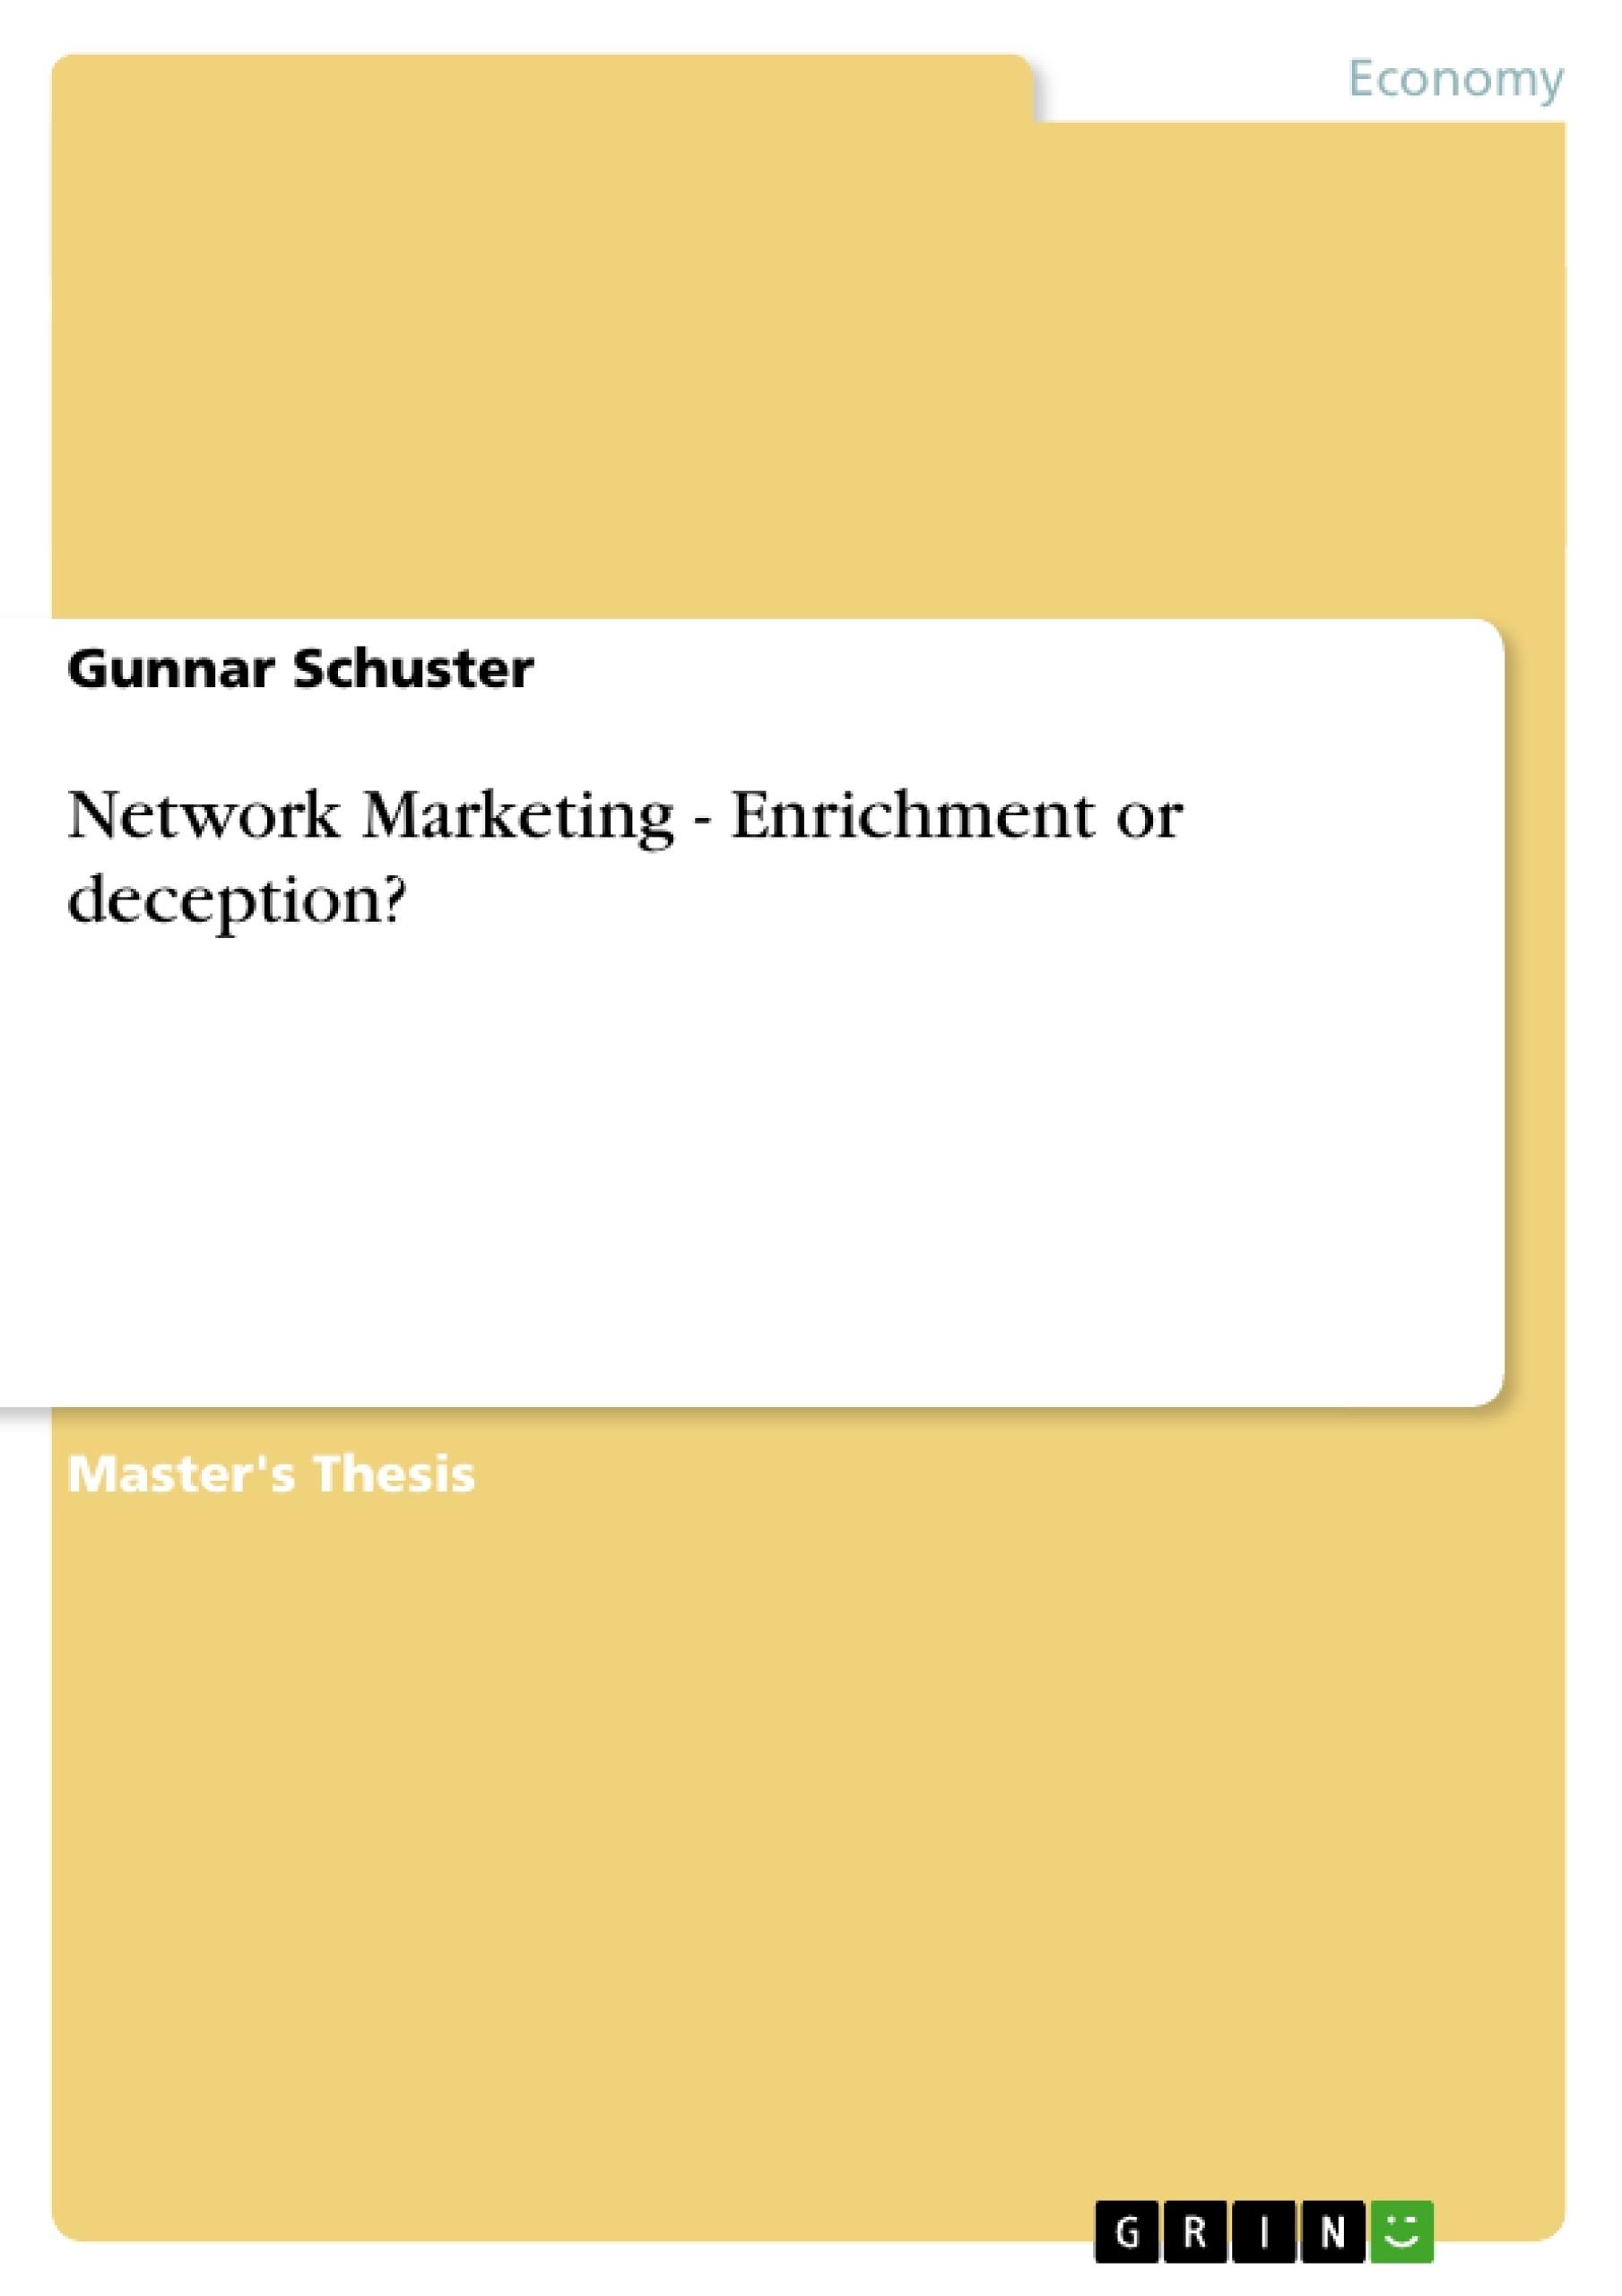 Title: Network Marketing - Enrichment or deception?